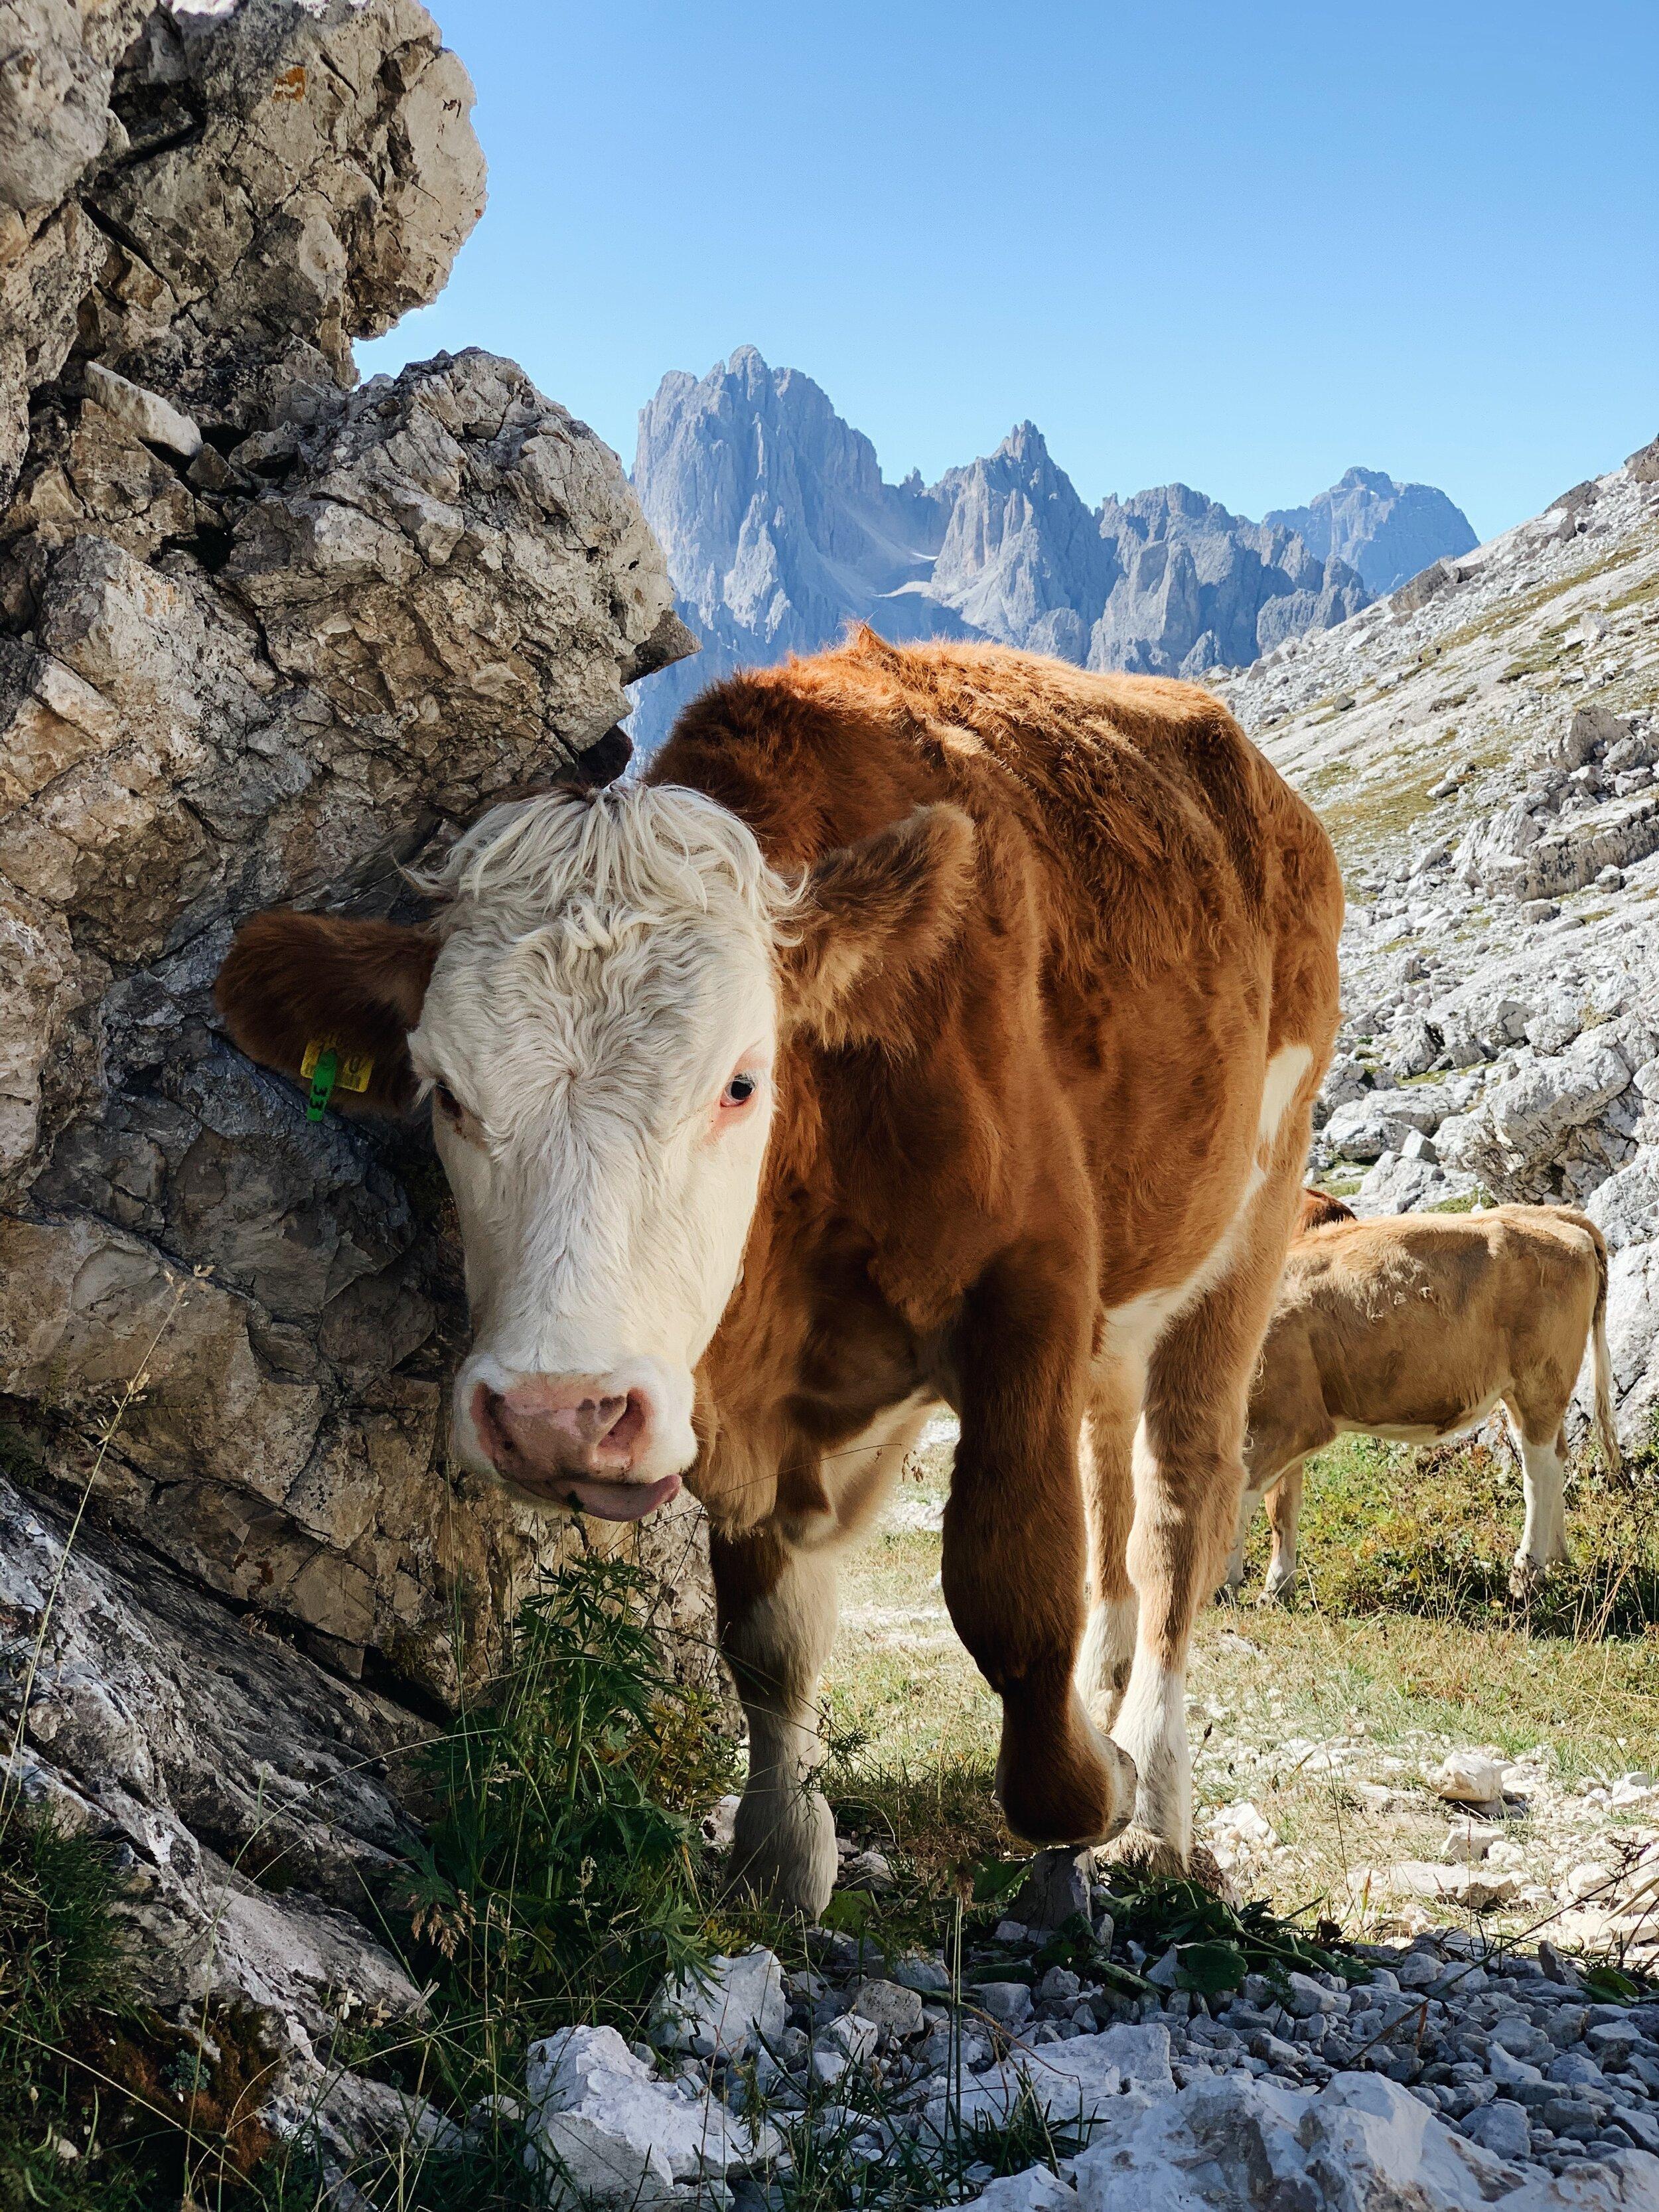 Cow friend.